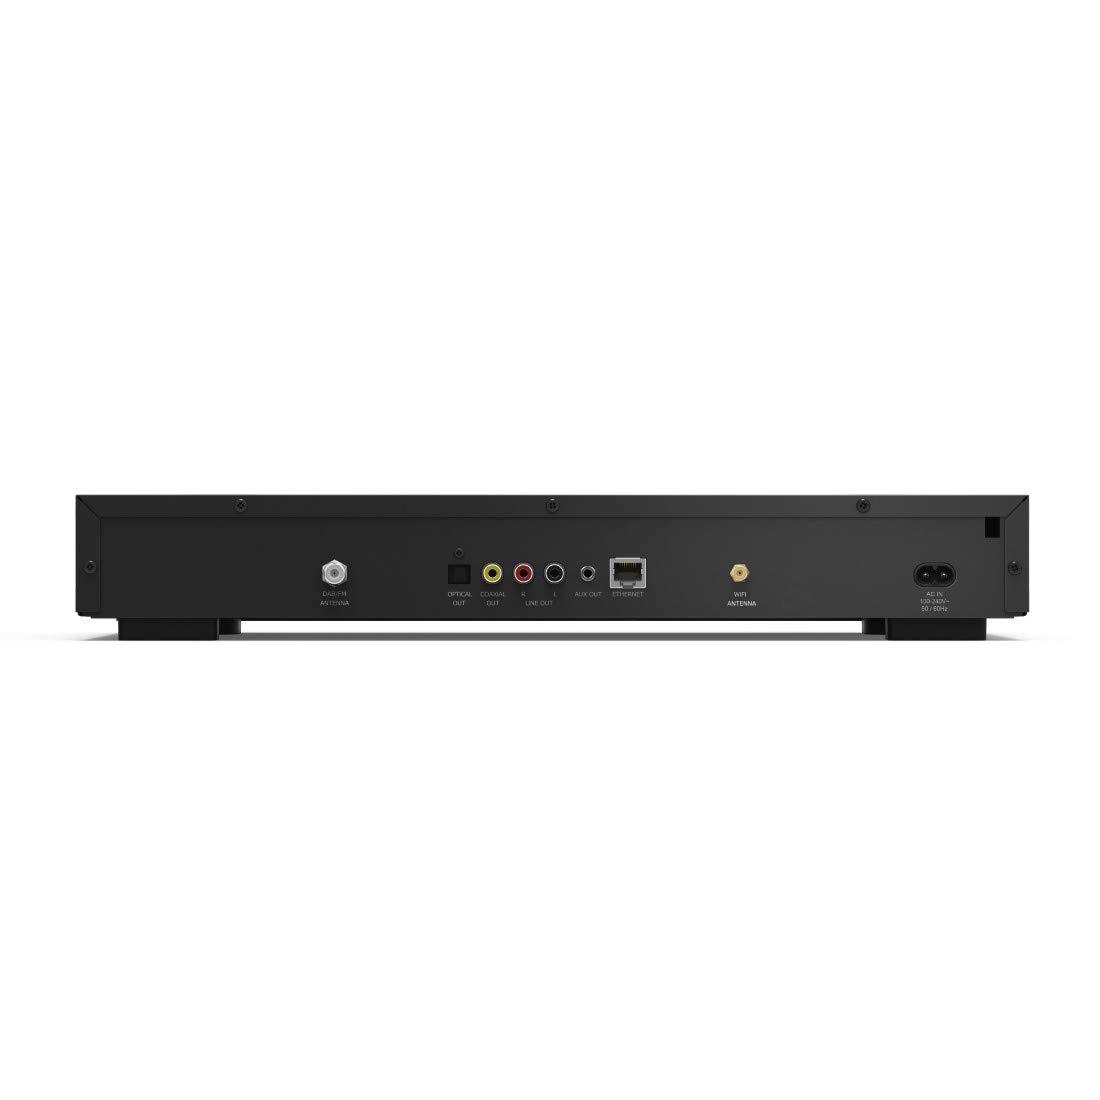 Hama Digital HiFi-Tuner Internetradio DIT2005M schwarz Spotify, WLAN//LAN//DAB+//FM, 2,8 Farbdisplay, USB-Anschluss, Netzwerk-Streamingfunktion, Wecker-Funktion, Multiroom, Fernbedienung, UNDOK-App